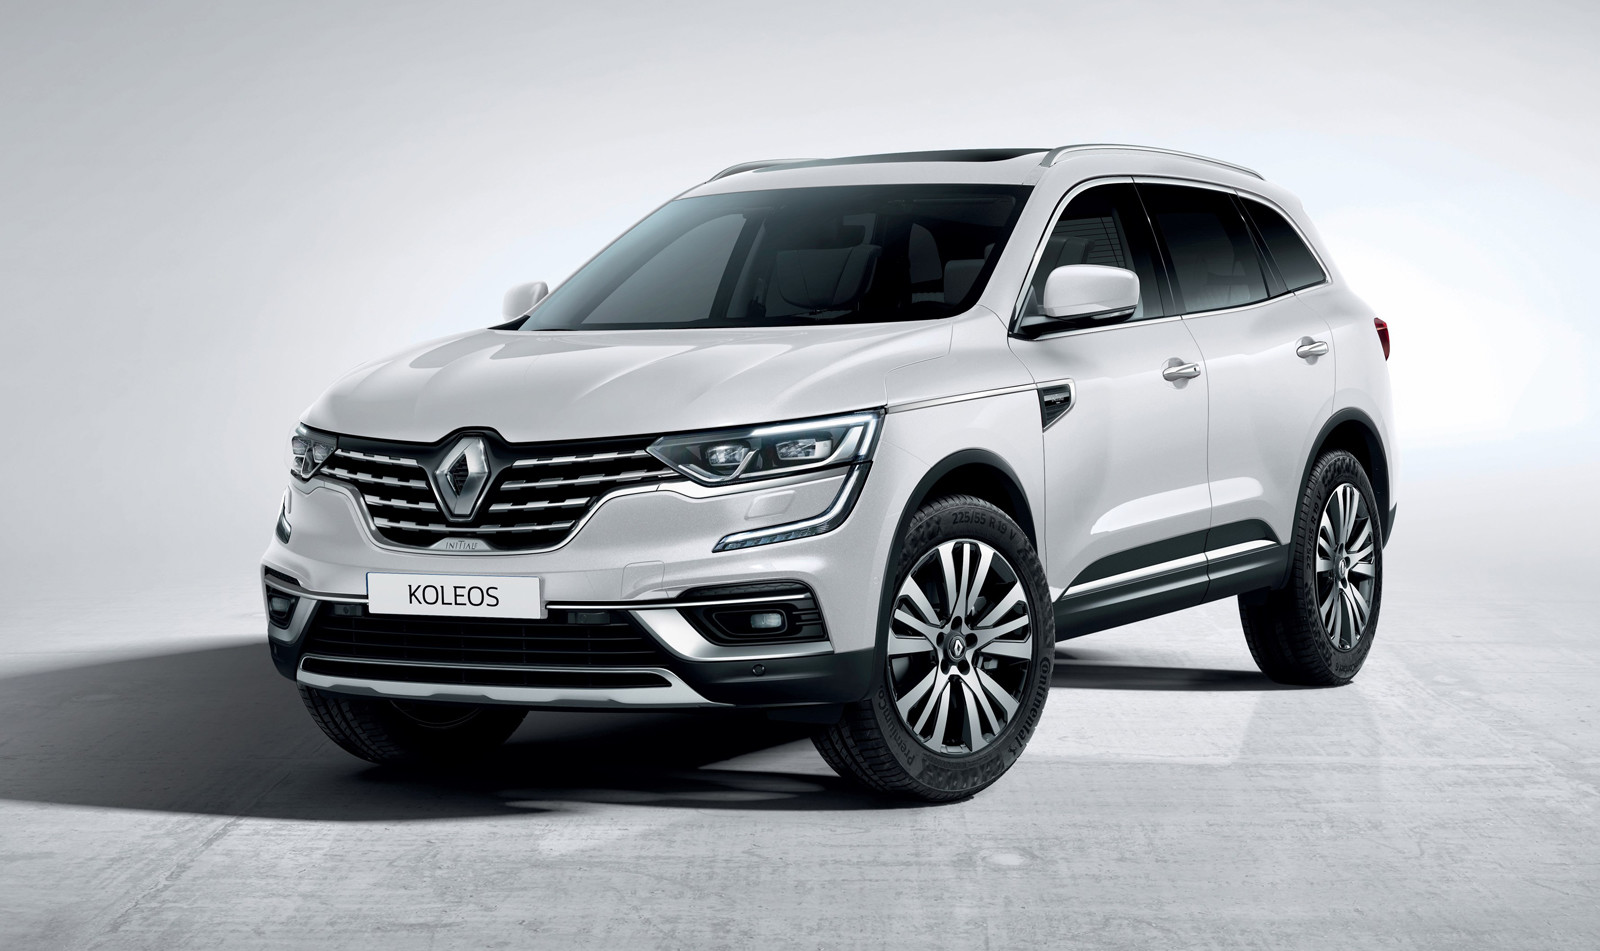 Foto de Renault Koleos 2019 (1/10)